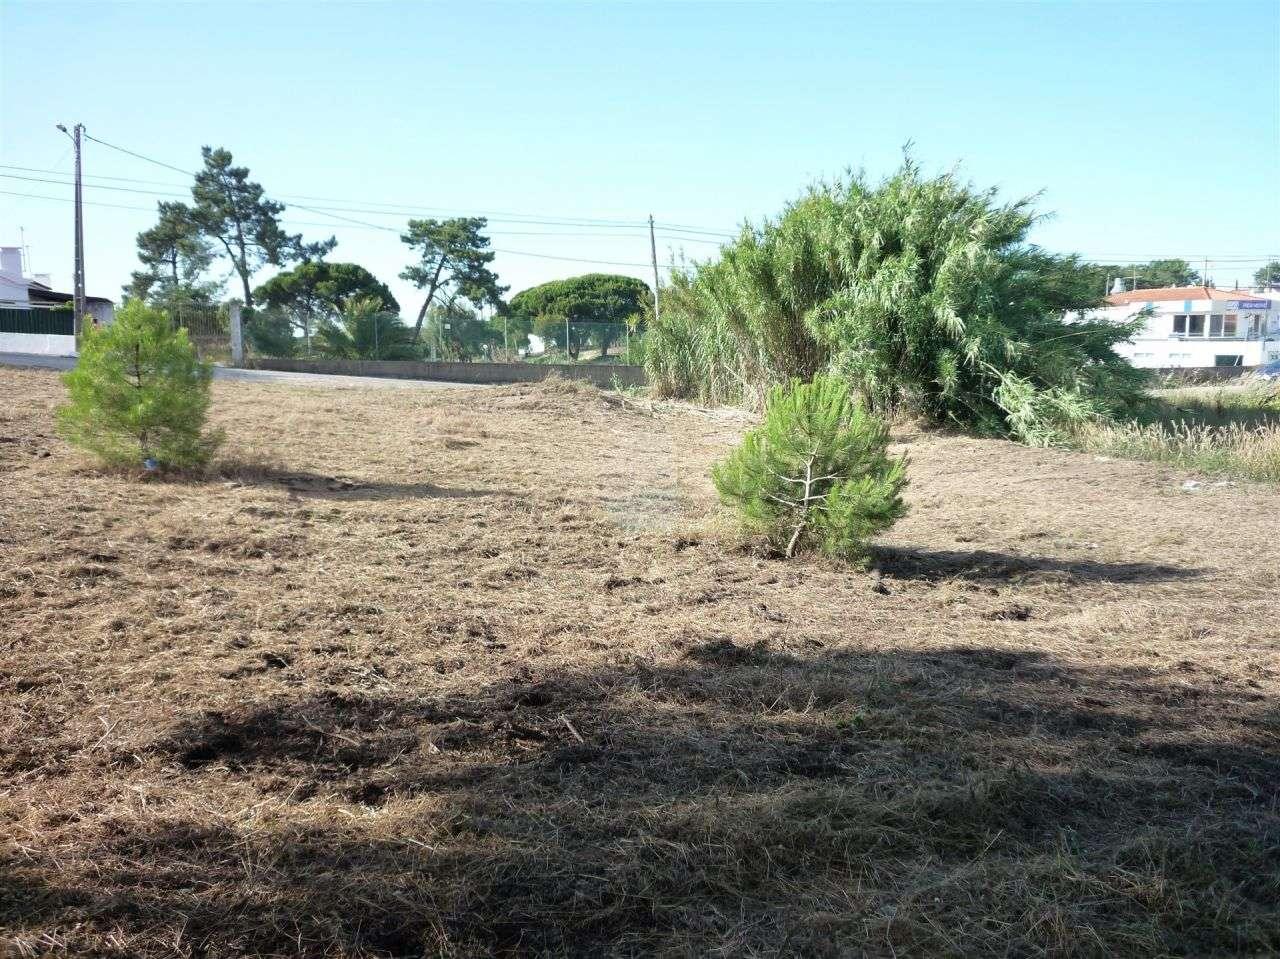 Terreno para comprar, Castelo (Sesimbra), Setúbal - Foto 5